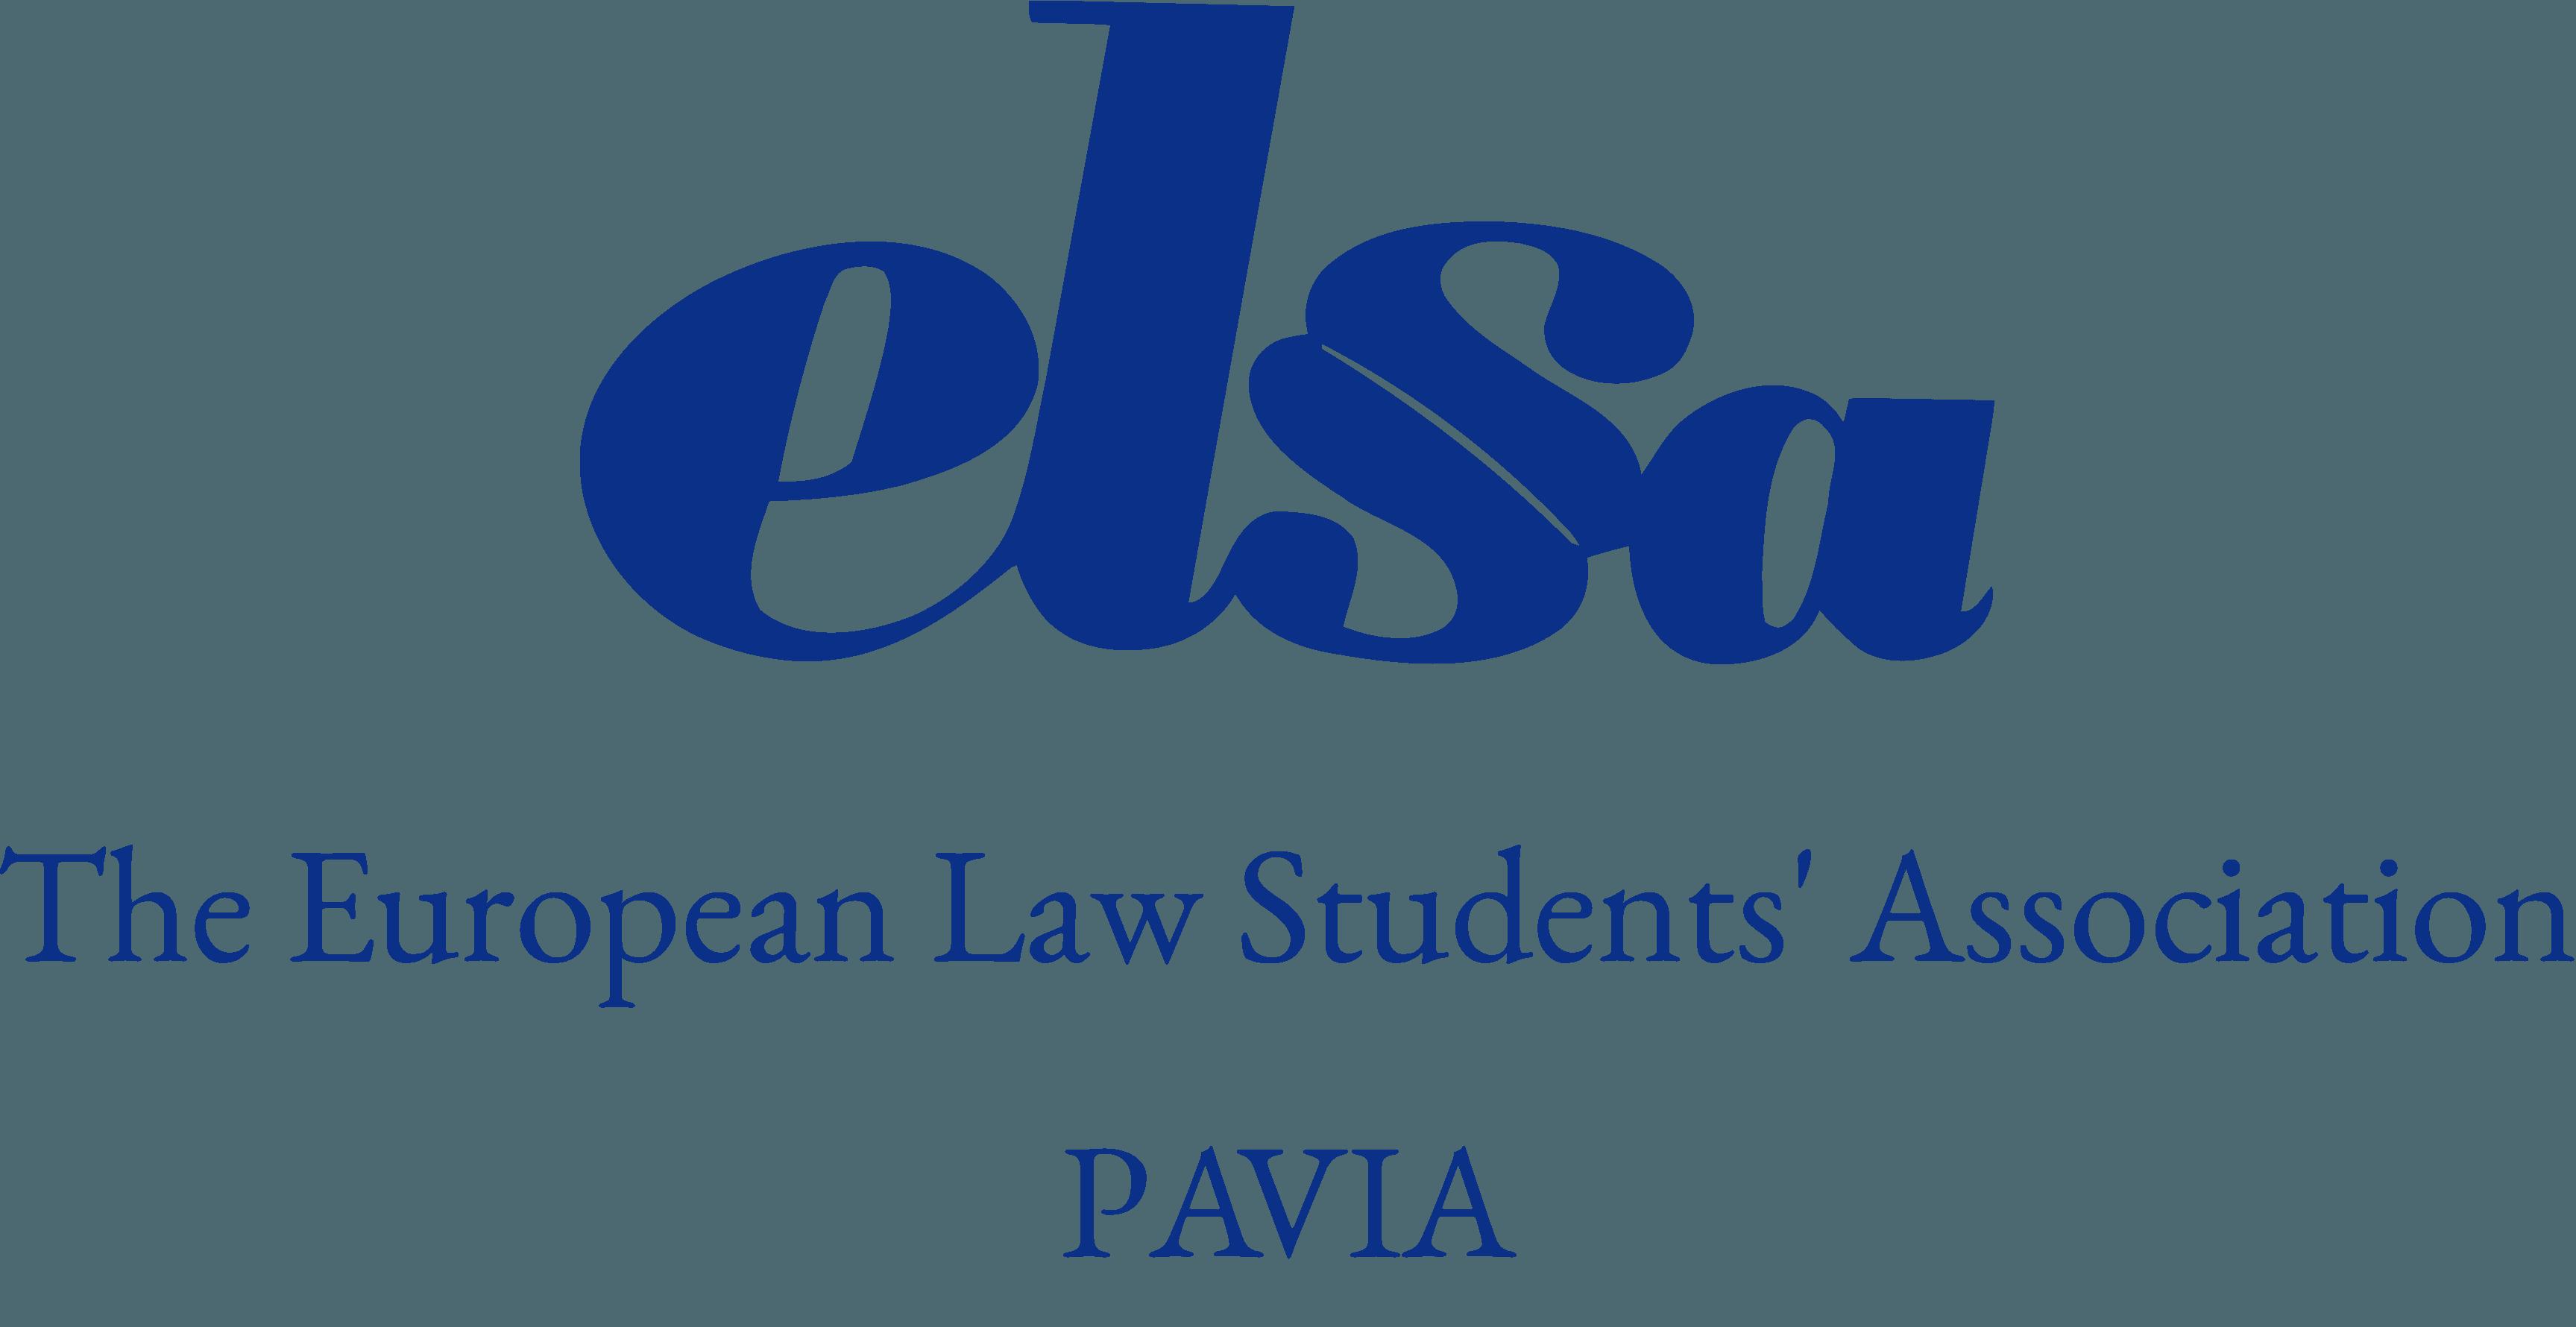 ELSA Pavia